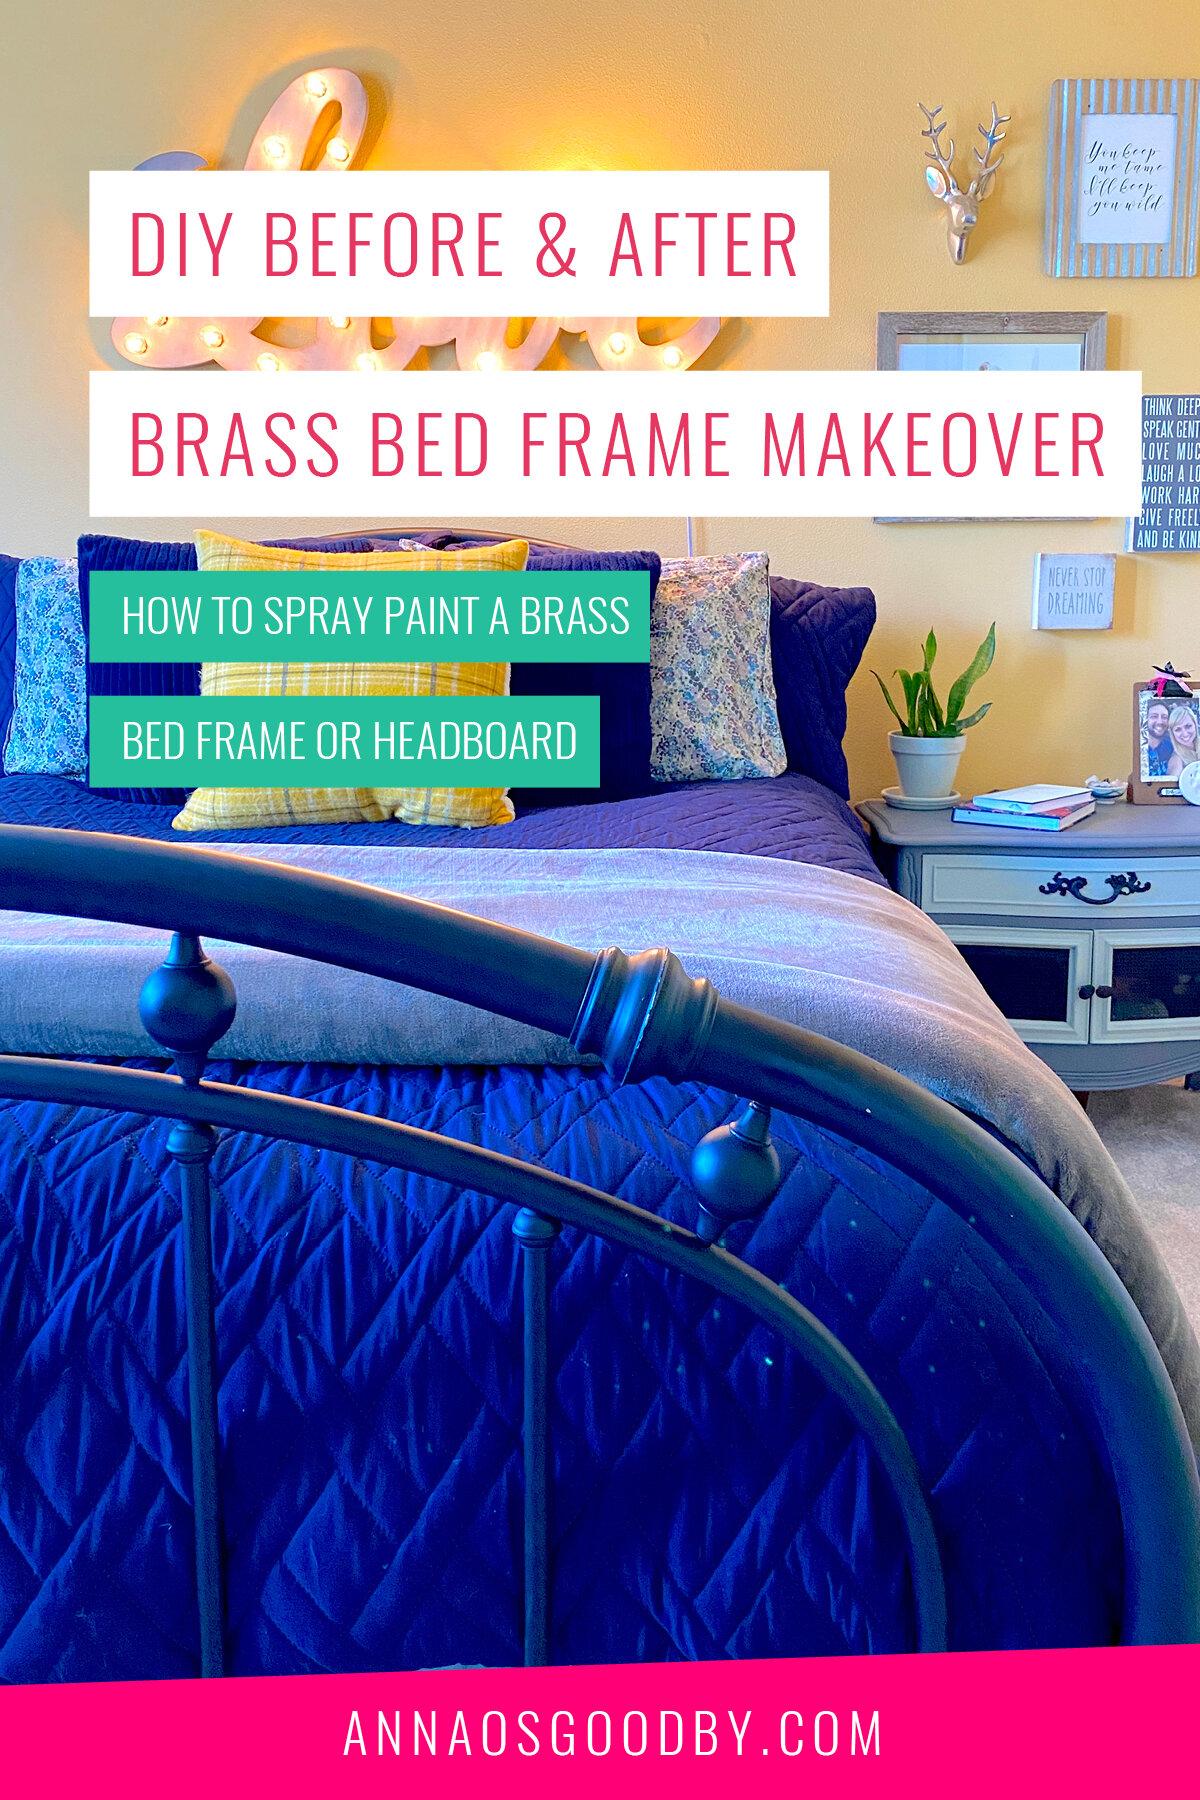 Brass Headboard Diy Blog Anna Osgoodby Life Biz Seattle Lifestyle Blogger Goals Coach